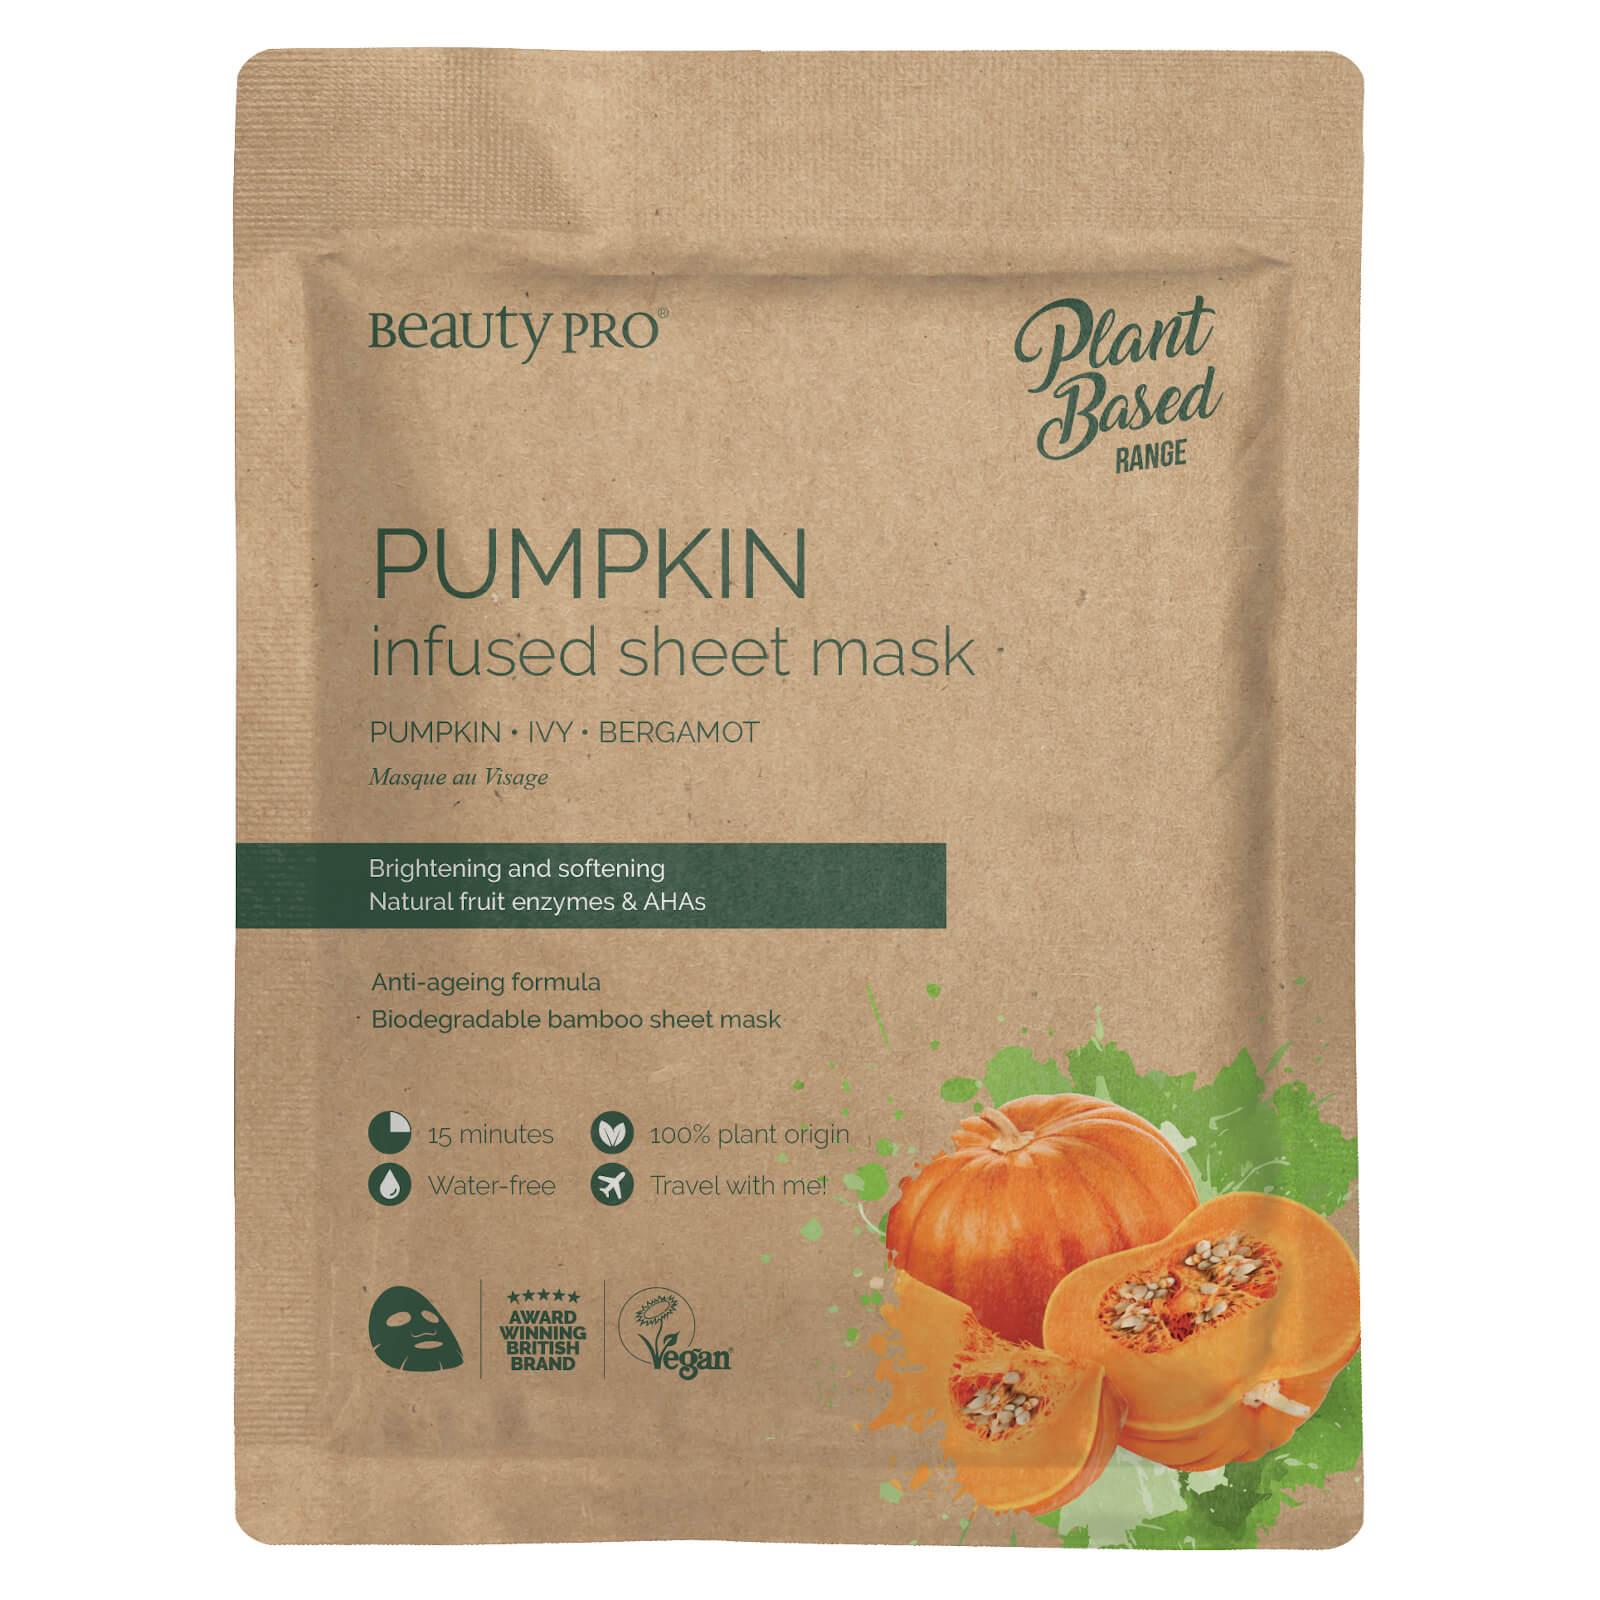 BeautyPro Pumpkin Infused Sheet Mask